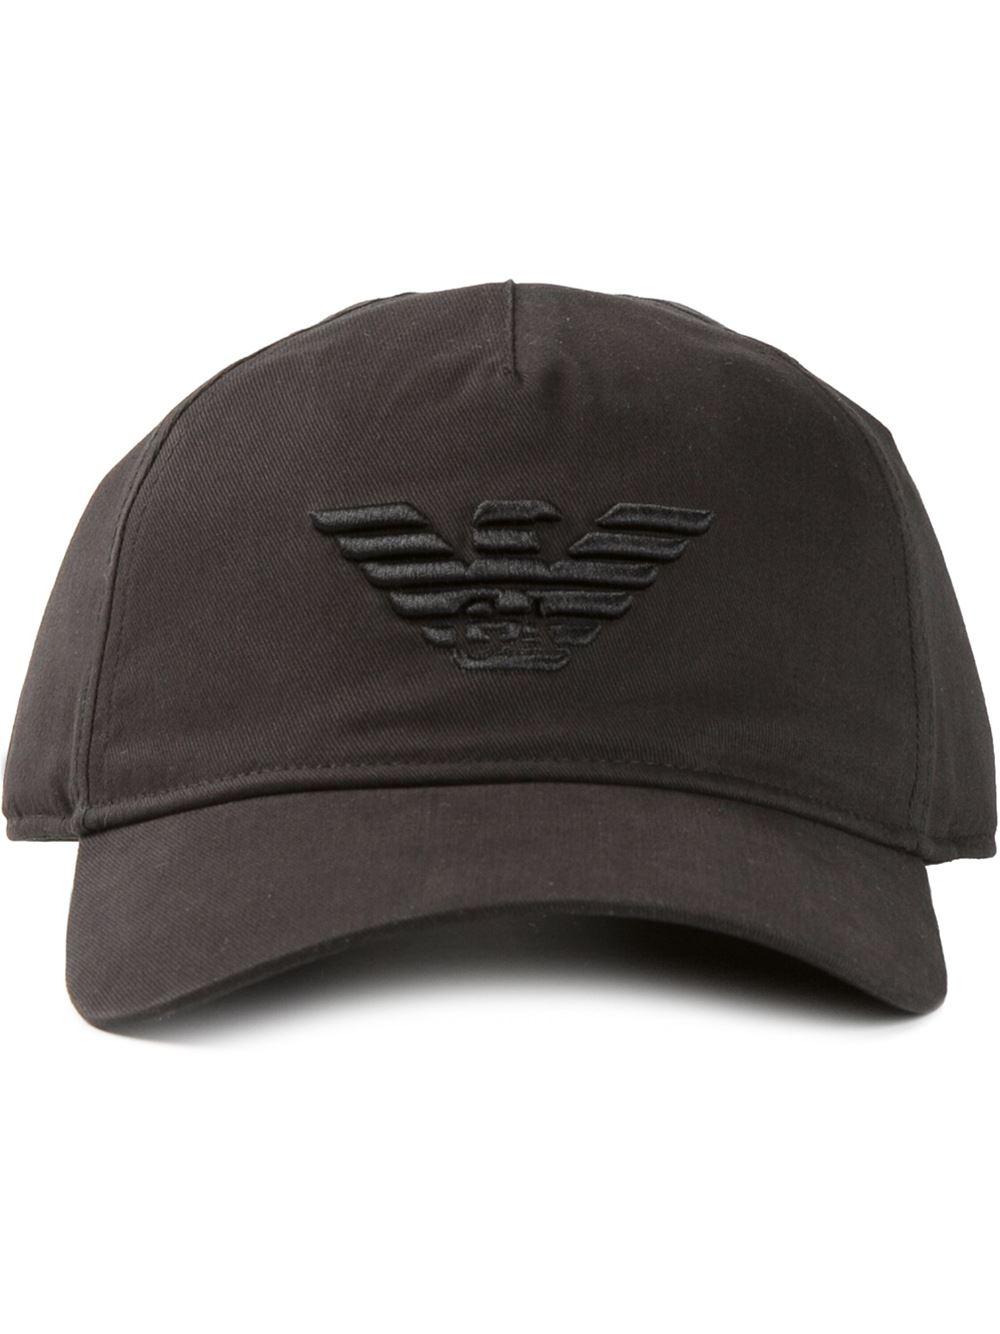 530b9bd37c7 Lyst - Emporio Armani Logo Embroidered Baseball Cap in Black for Men